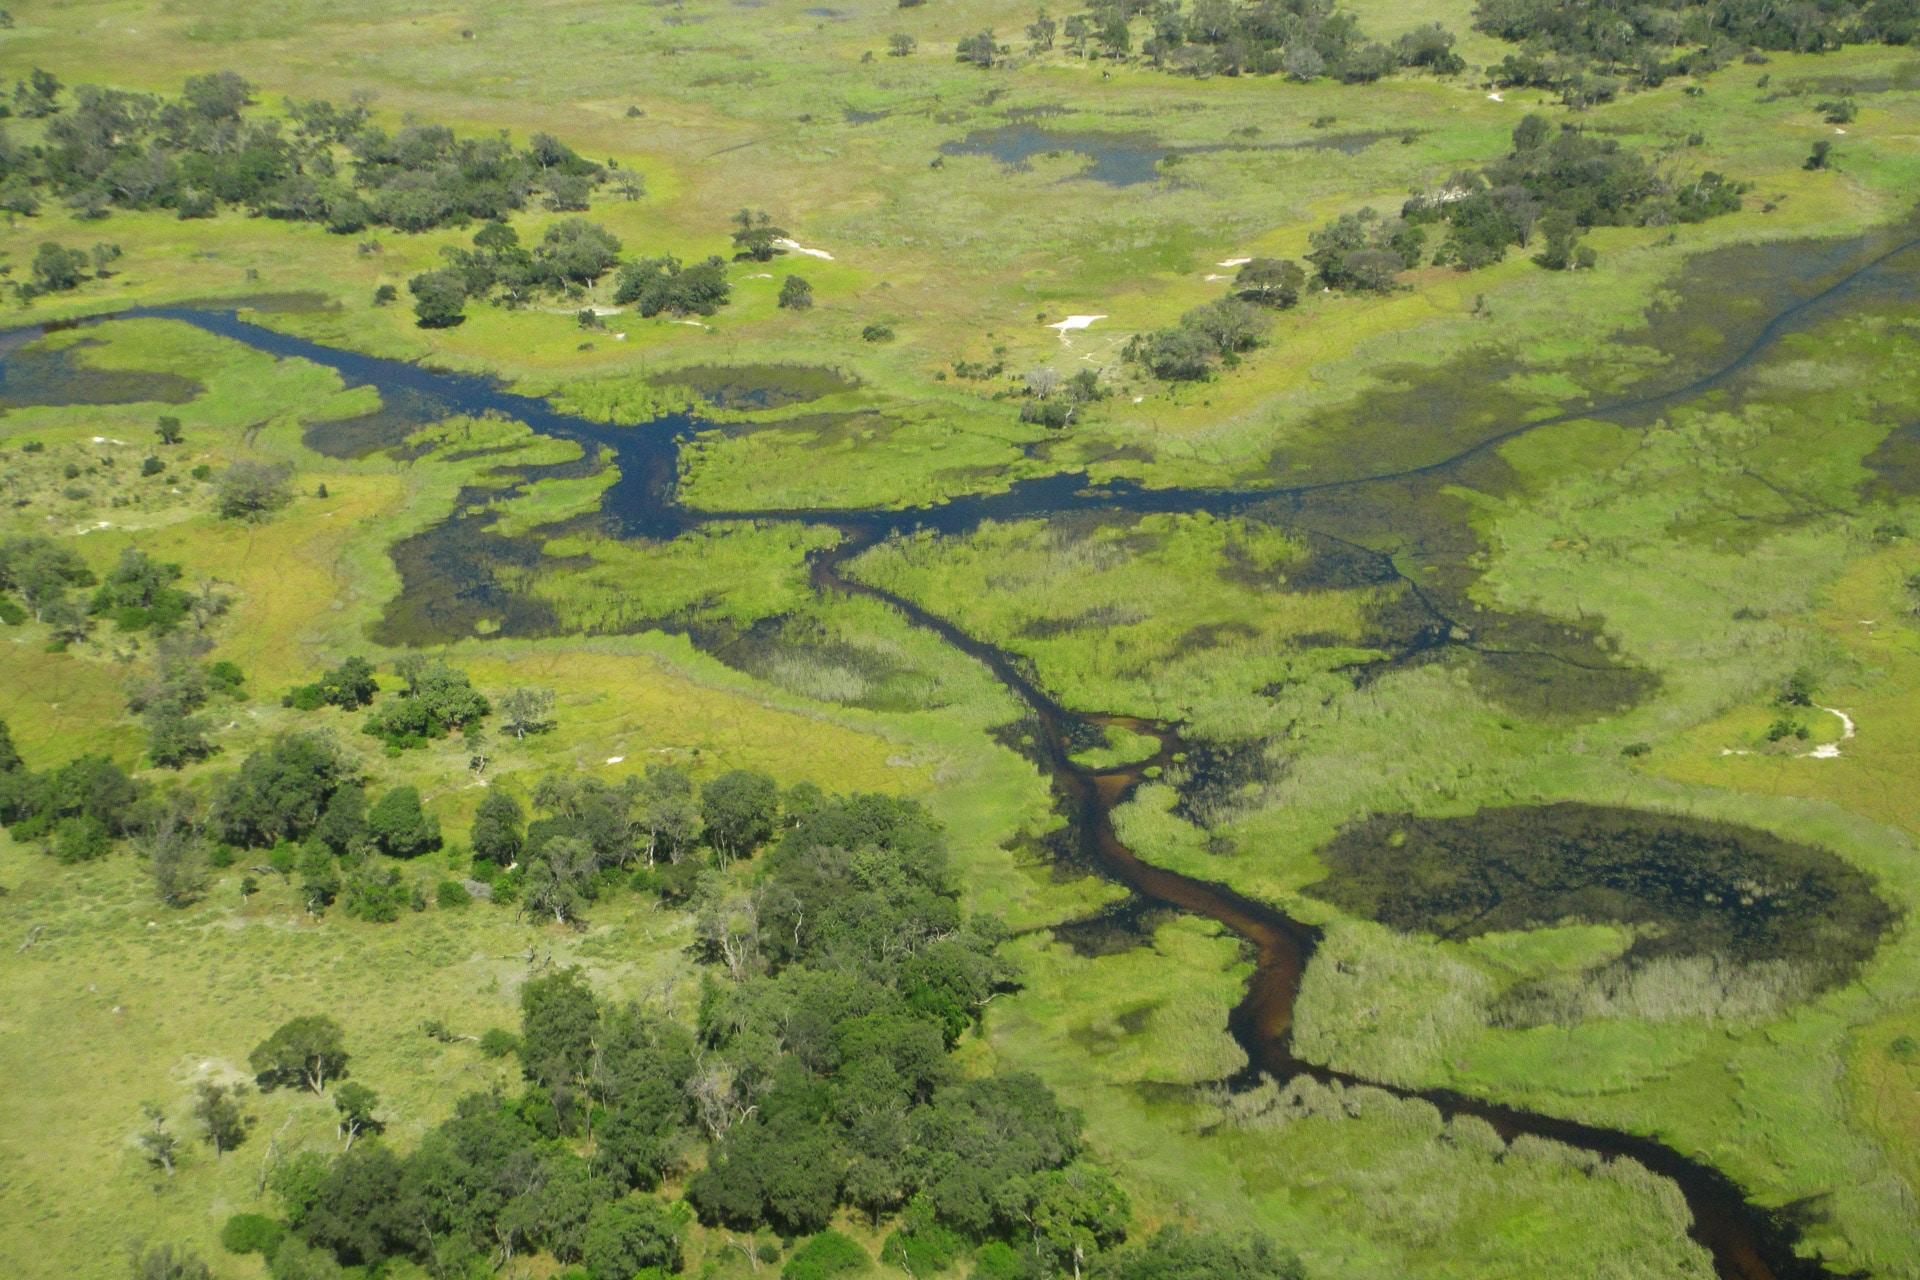 Okavango-Delta-Globetrotter-Select-Seigert-5